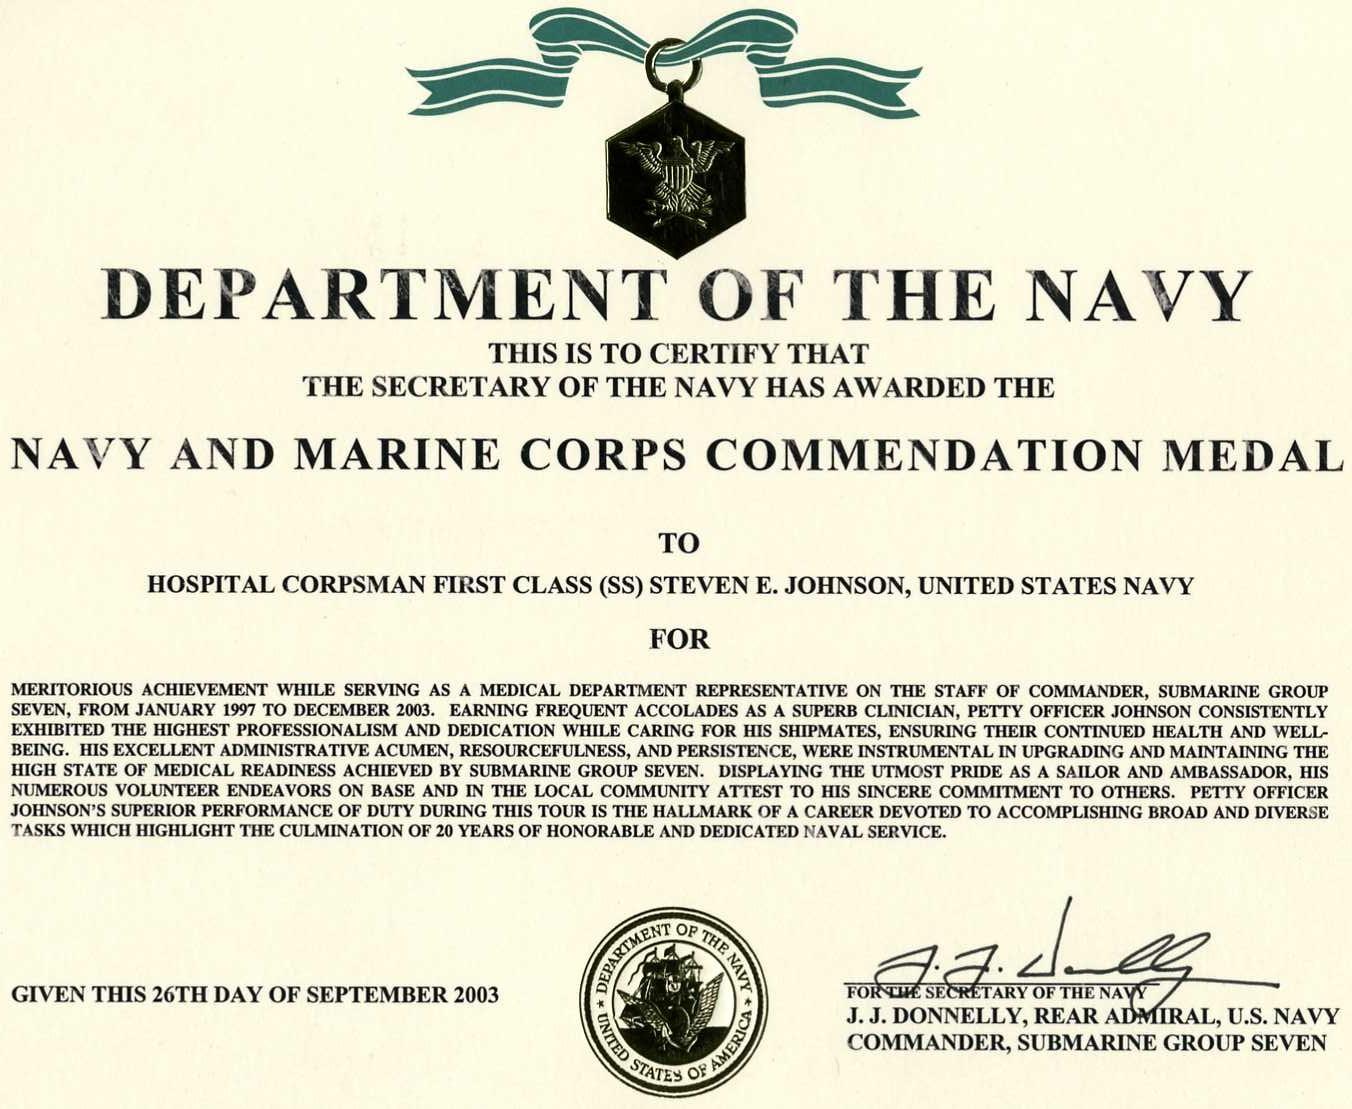 certificate of commendation usmc template - togetherweserved steven johnson hm1